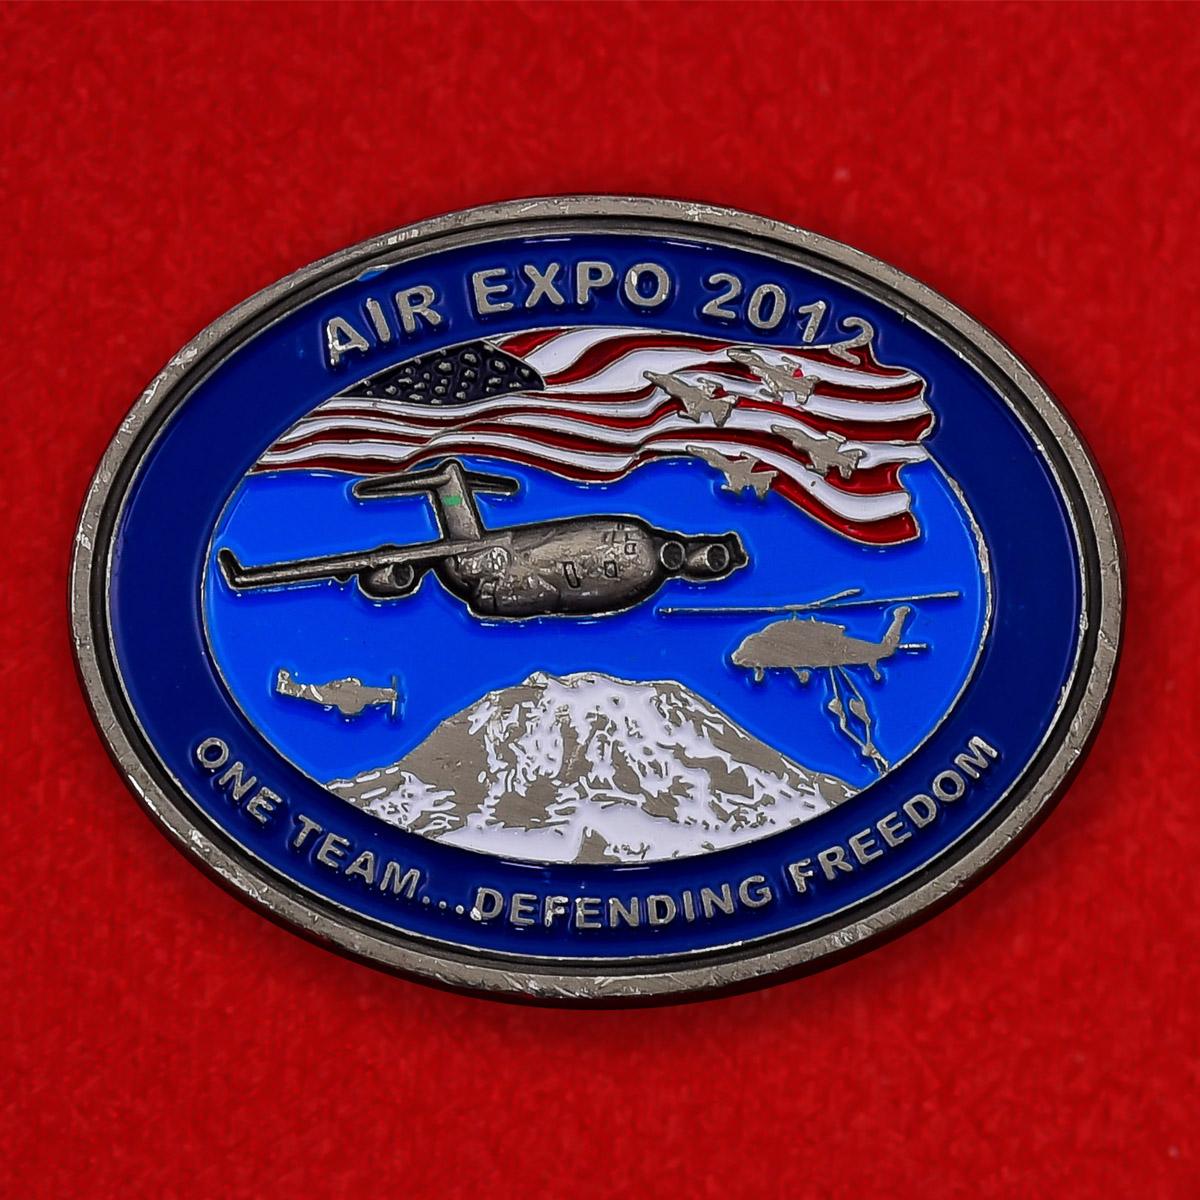 "Челлендж коин ВВС США ""Авиашоу Аir Еxpo-2012 на базе Льюис-МакКорд"""